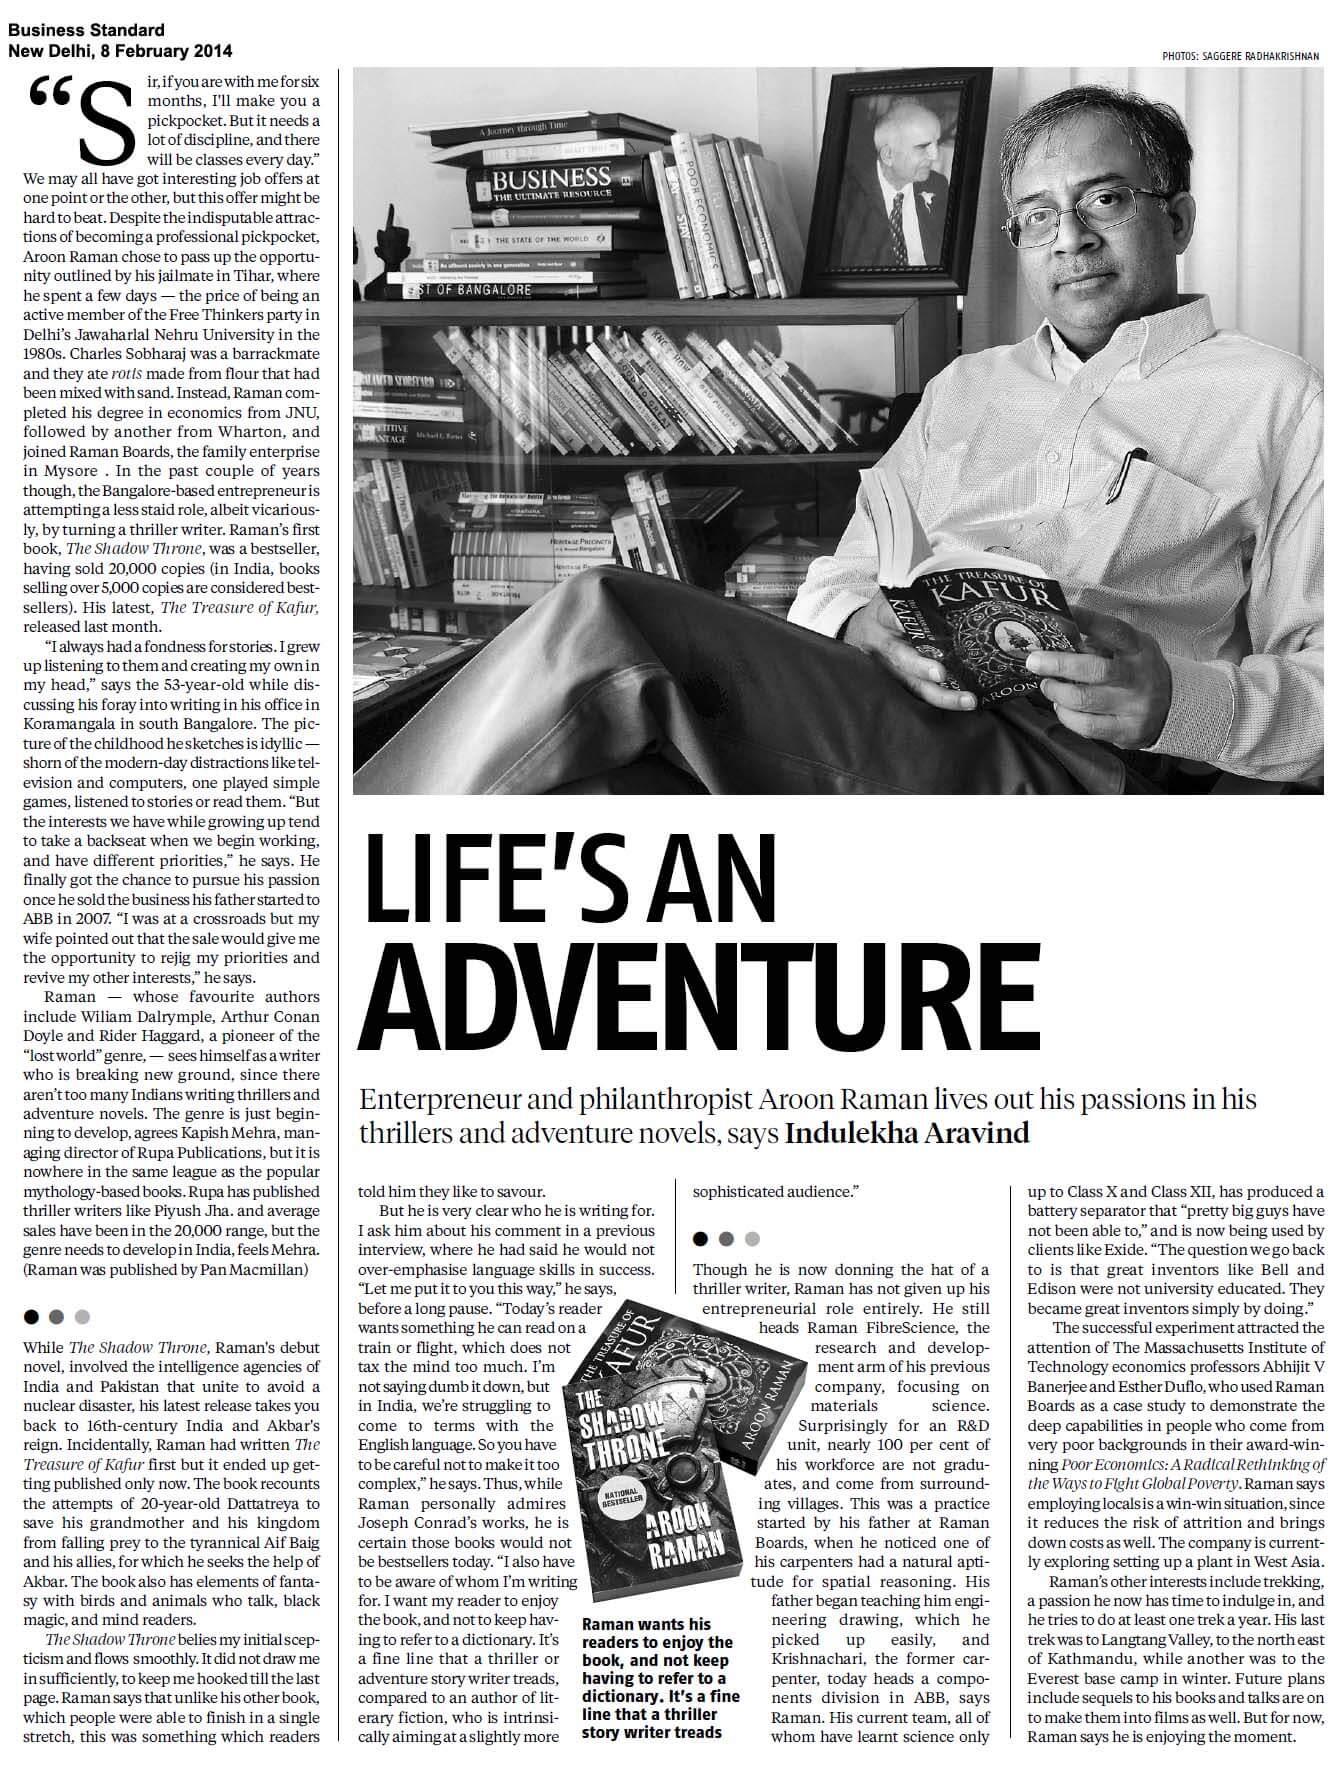 Aroon Raman: Life's an adventure